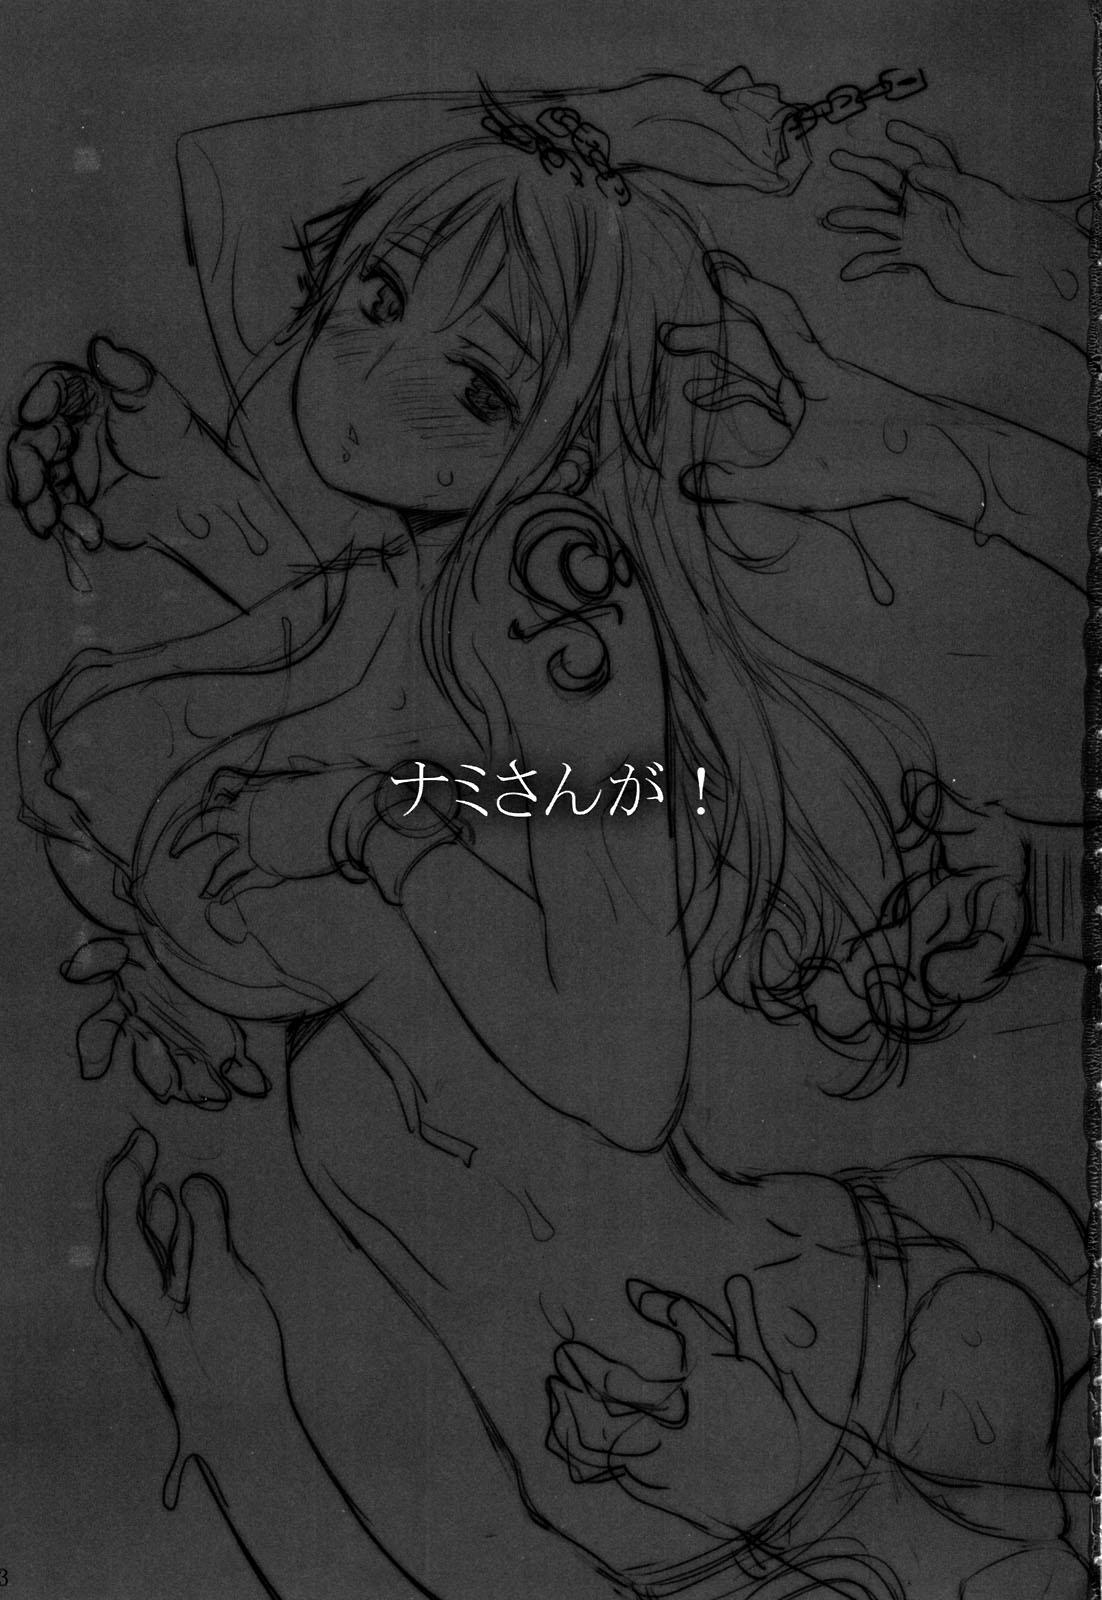 (C81) [Higuma-ya (Nora Higuma)] Nami-san ga! (One Piece) [English] colorized (incomplete) 2